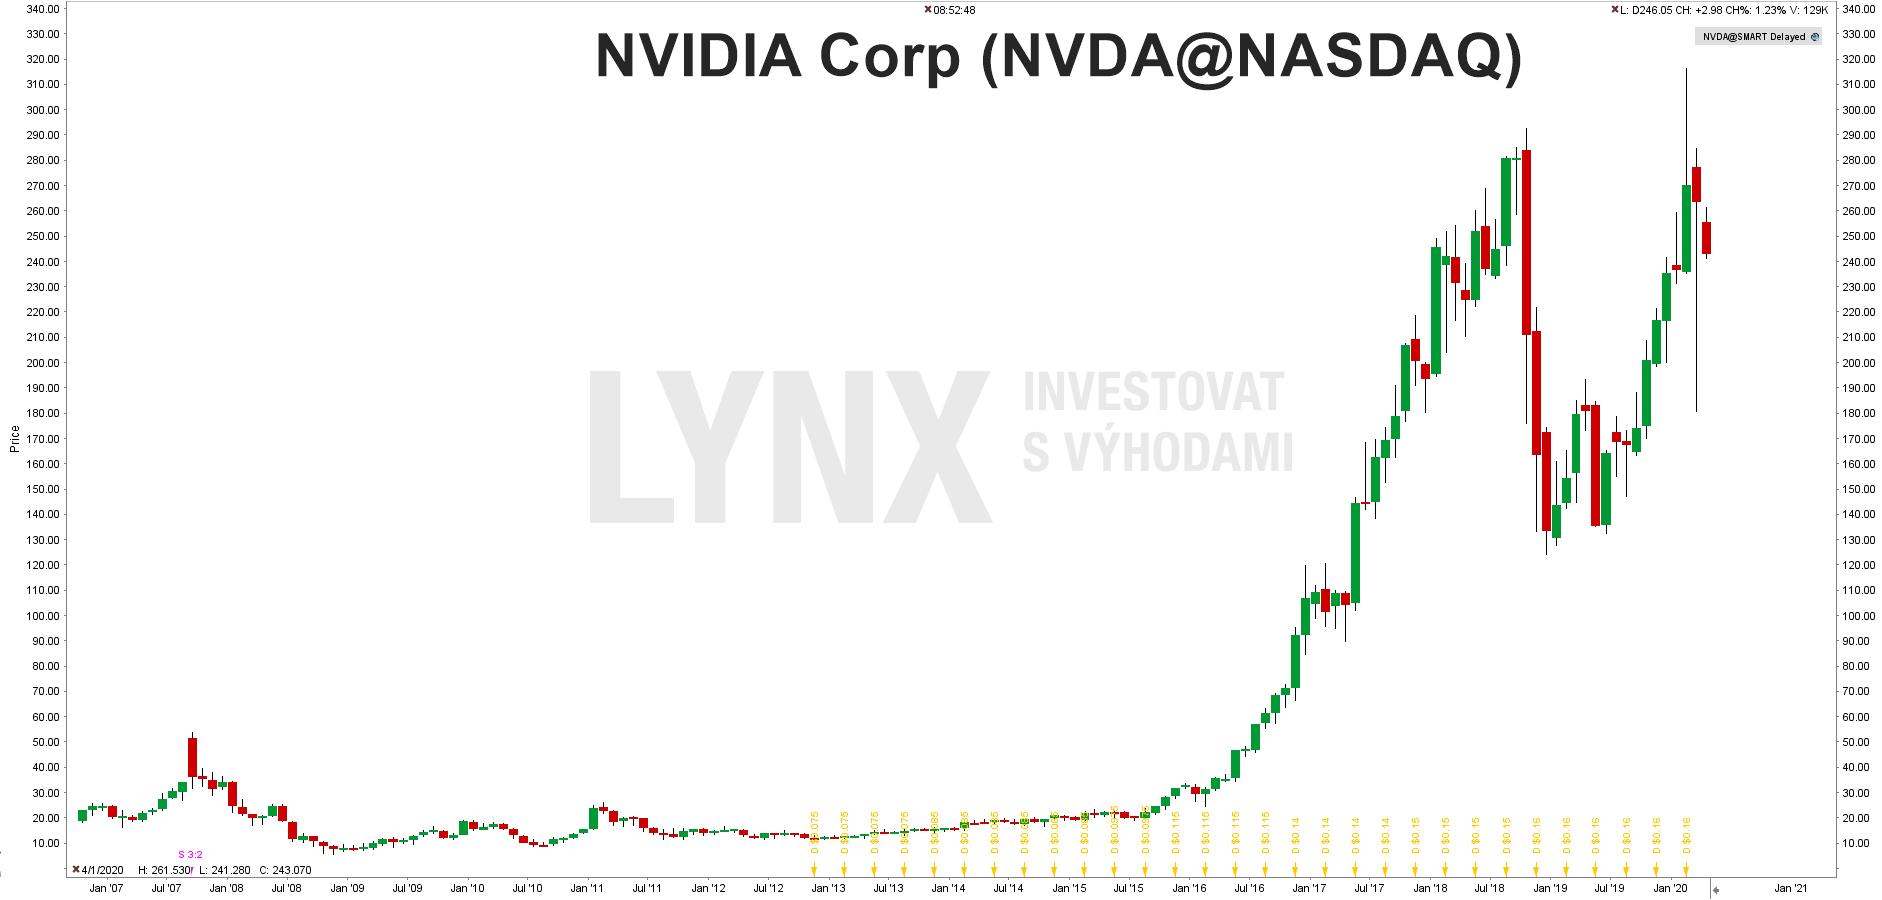 Graf akcie Nvidia Corp (NVDA)